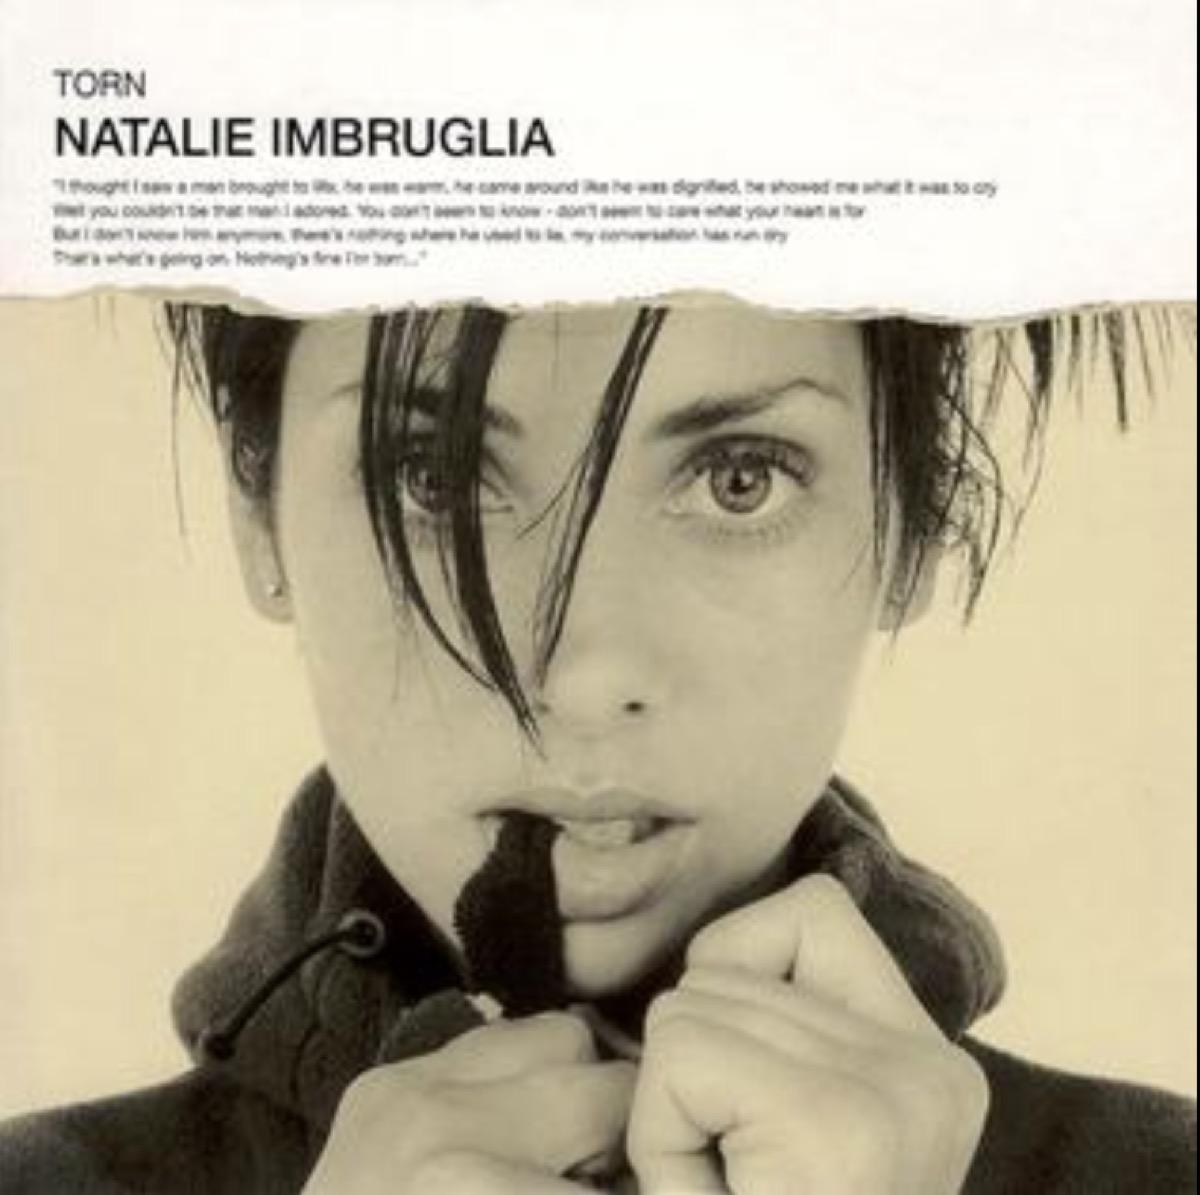 """Torn"" — Natalie Imbriglia (1997)"